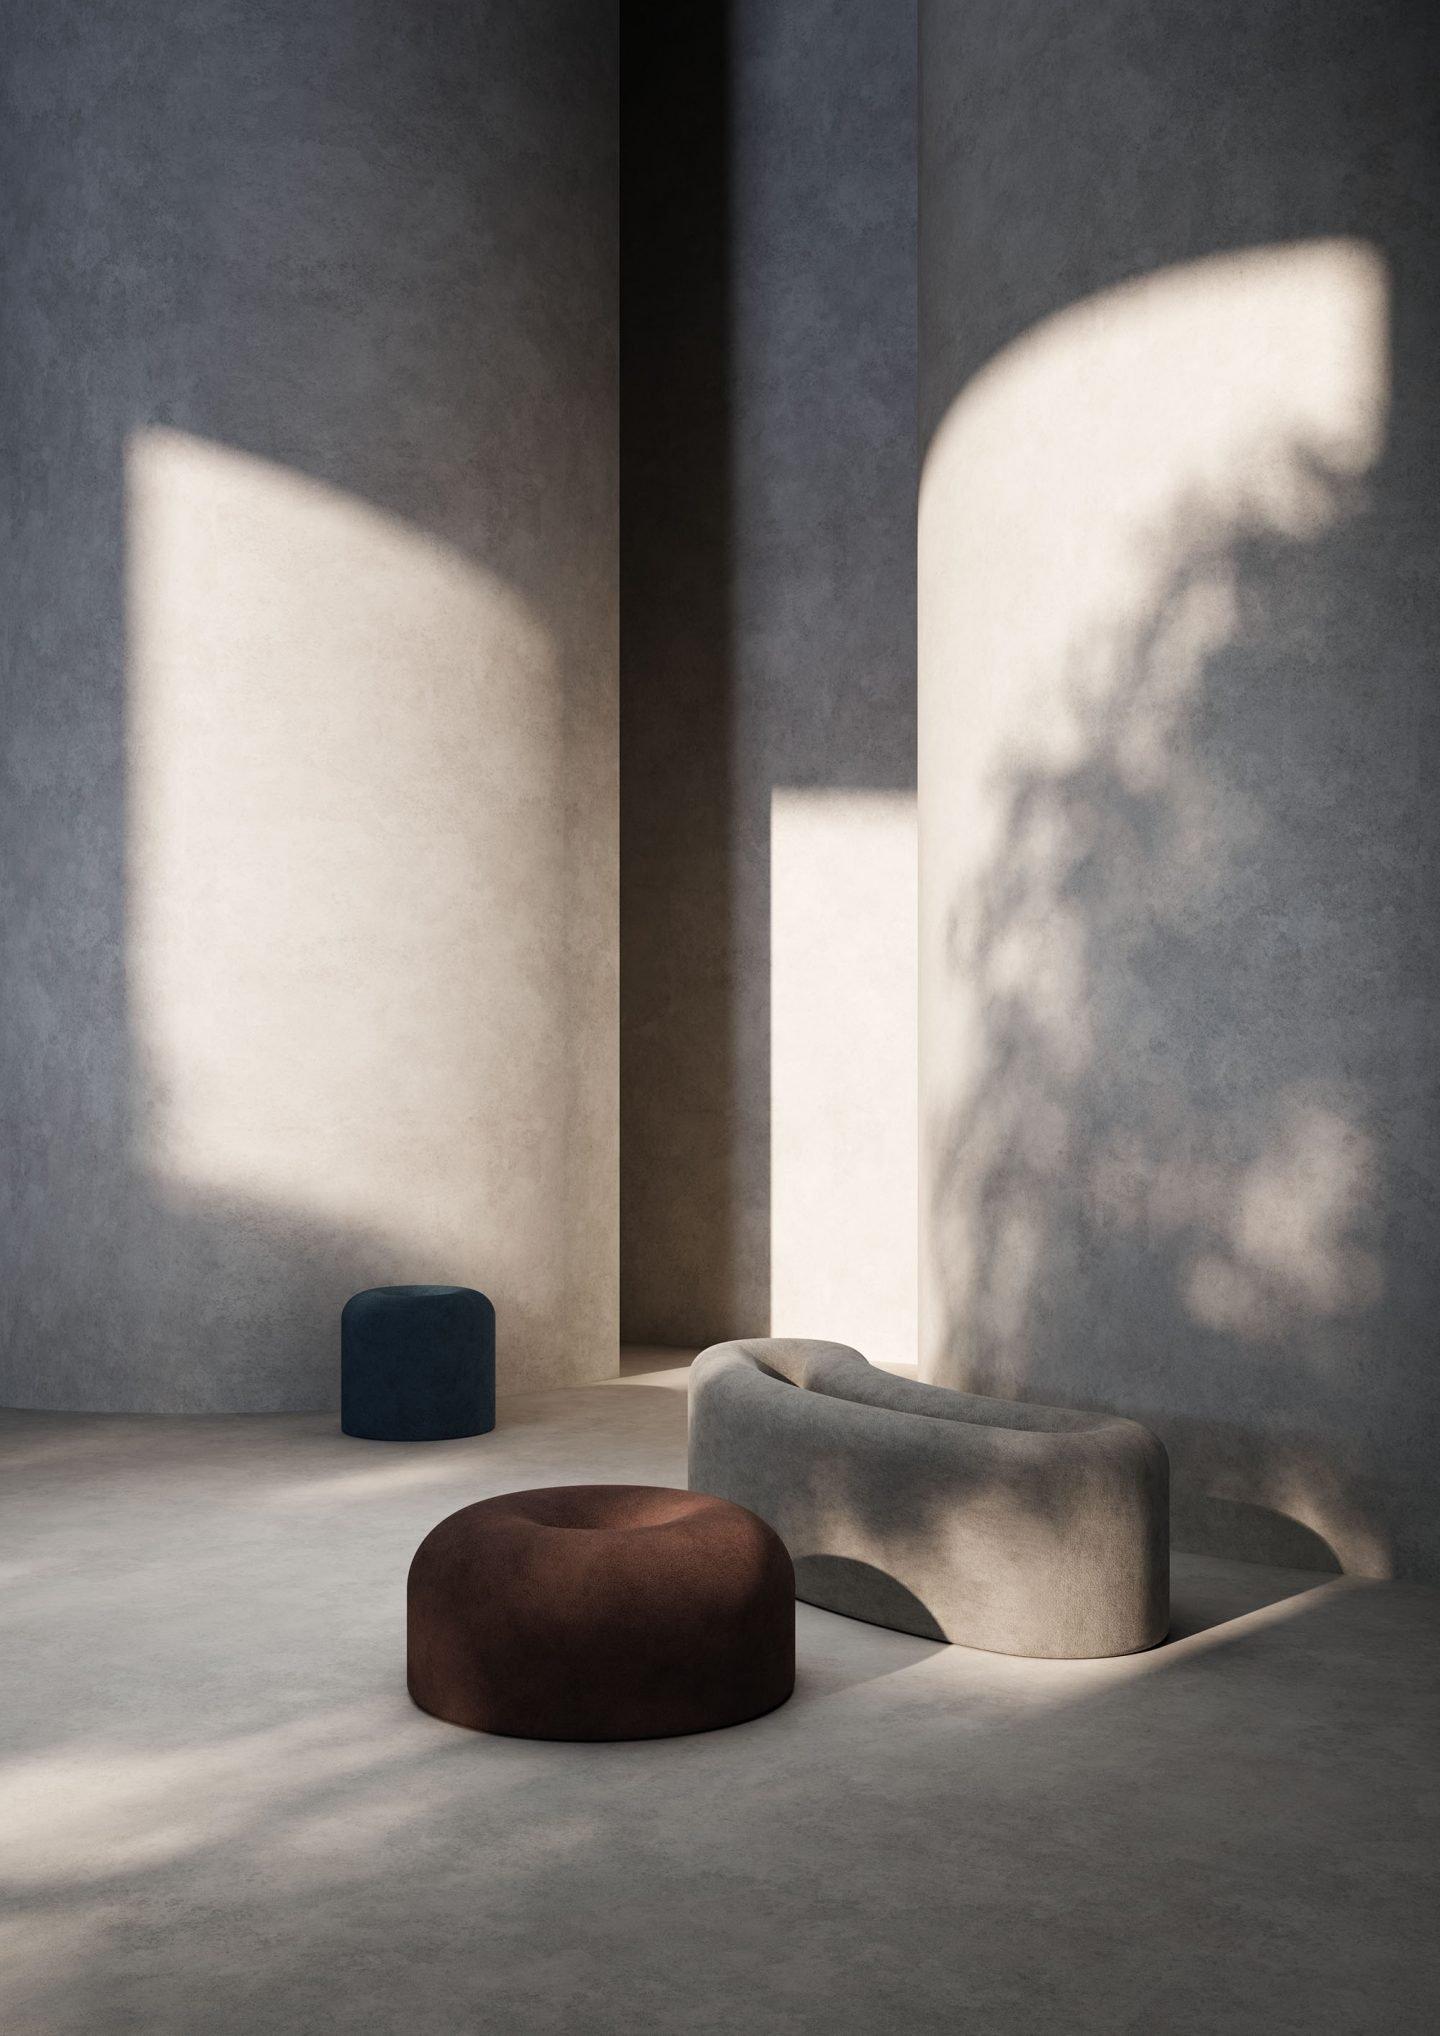 IGNANT-Design-MUTStudio-3D-Massimo-Colonna-Bao-LaCividina